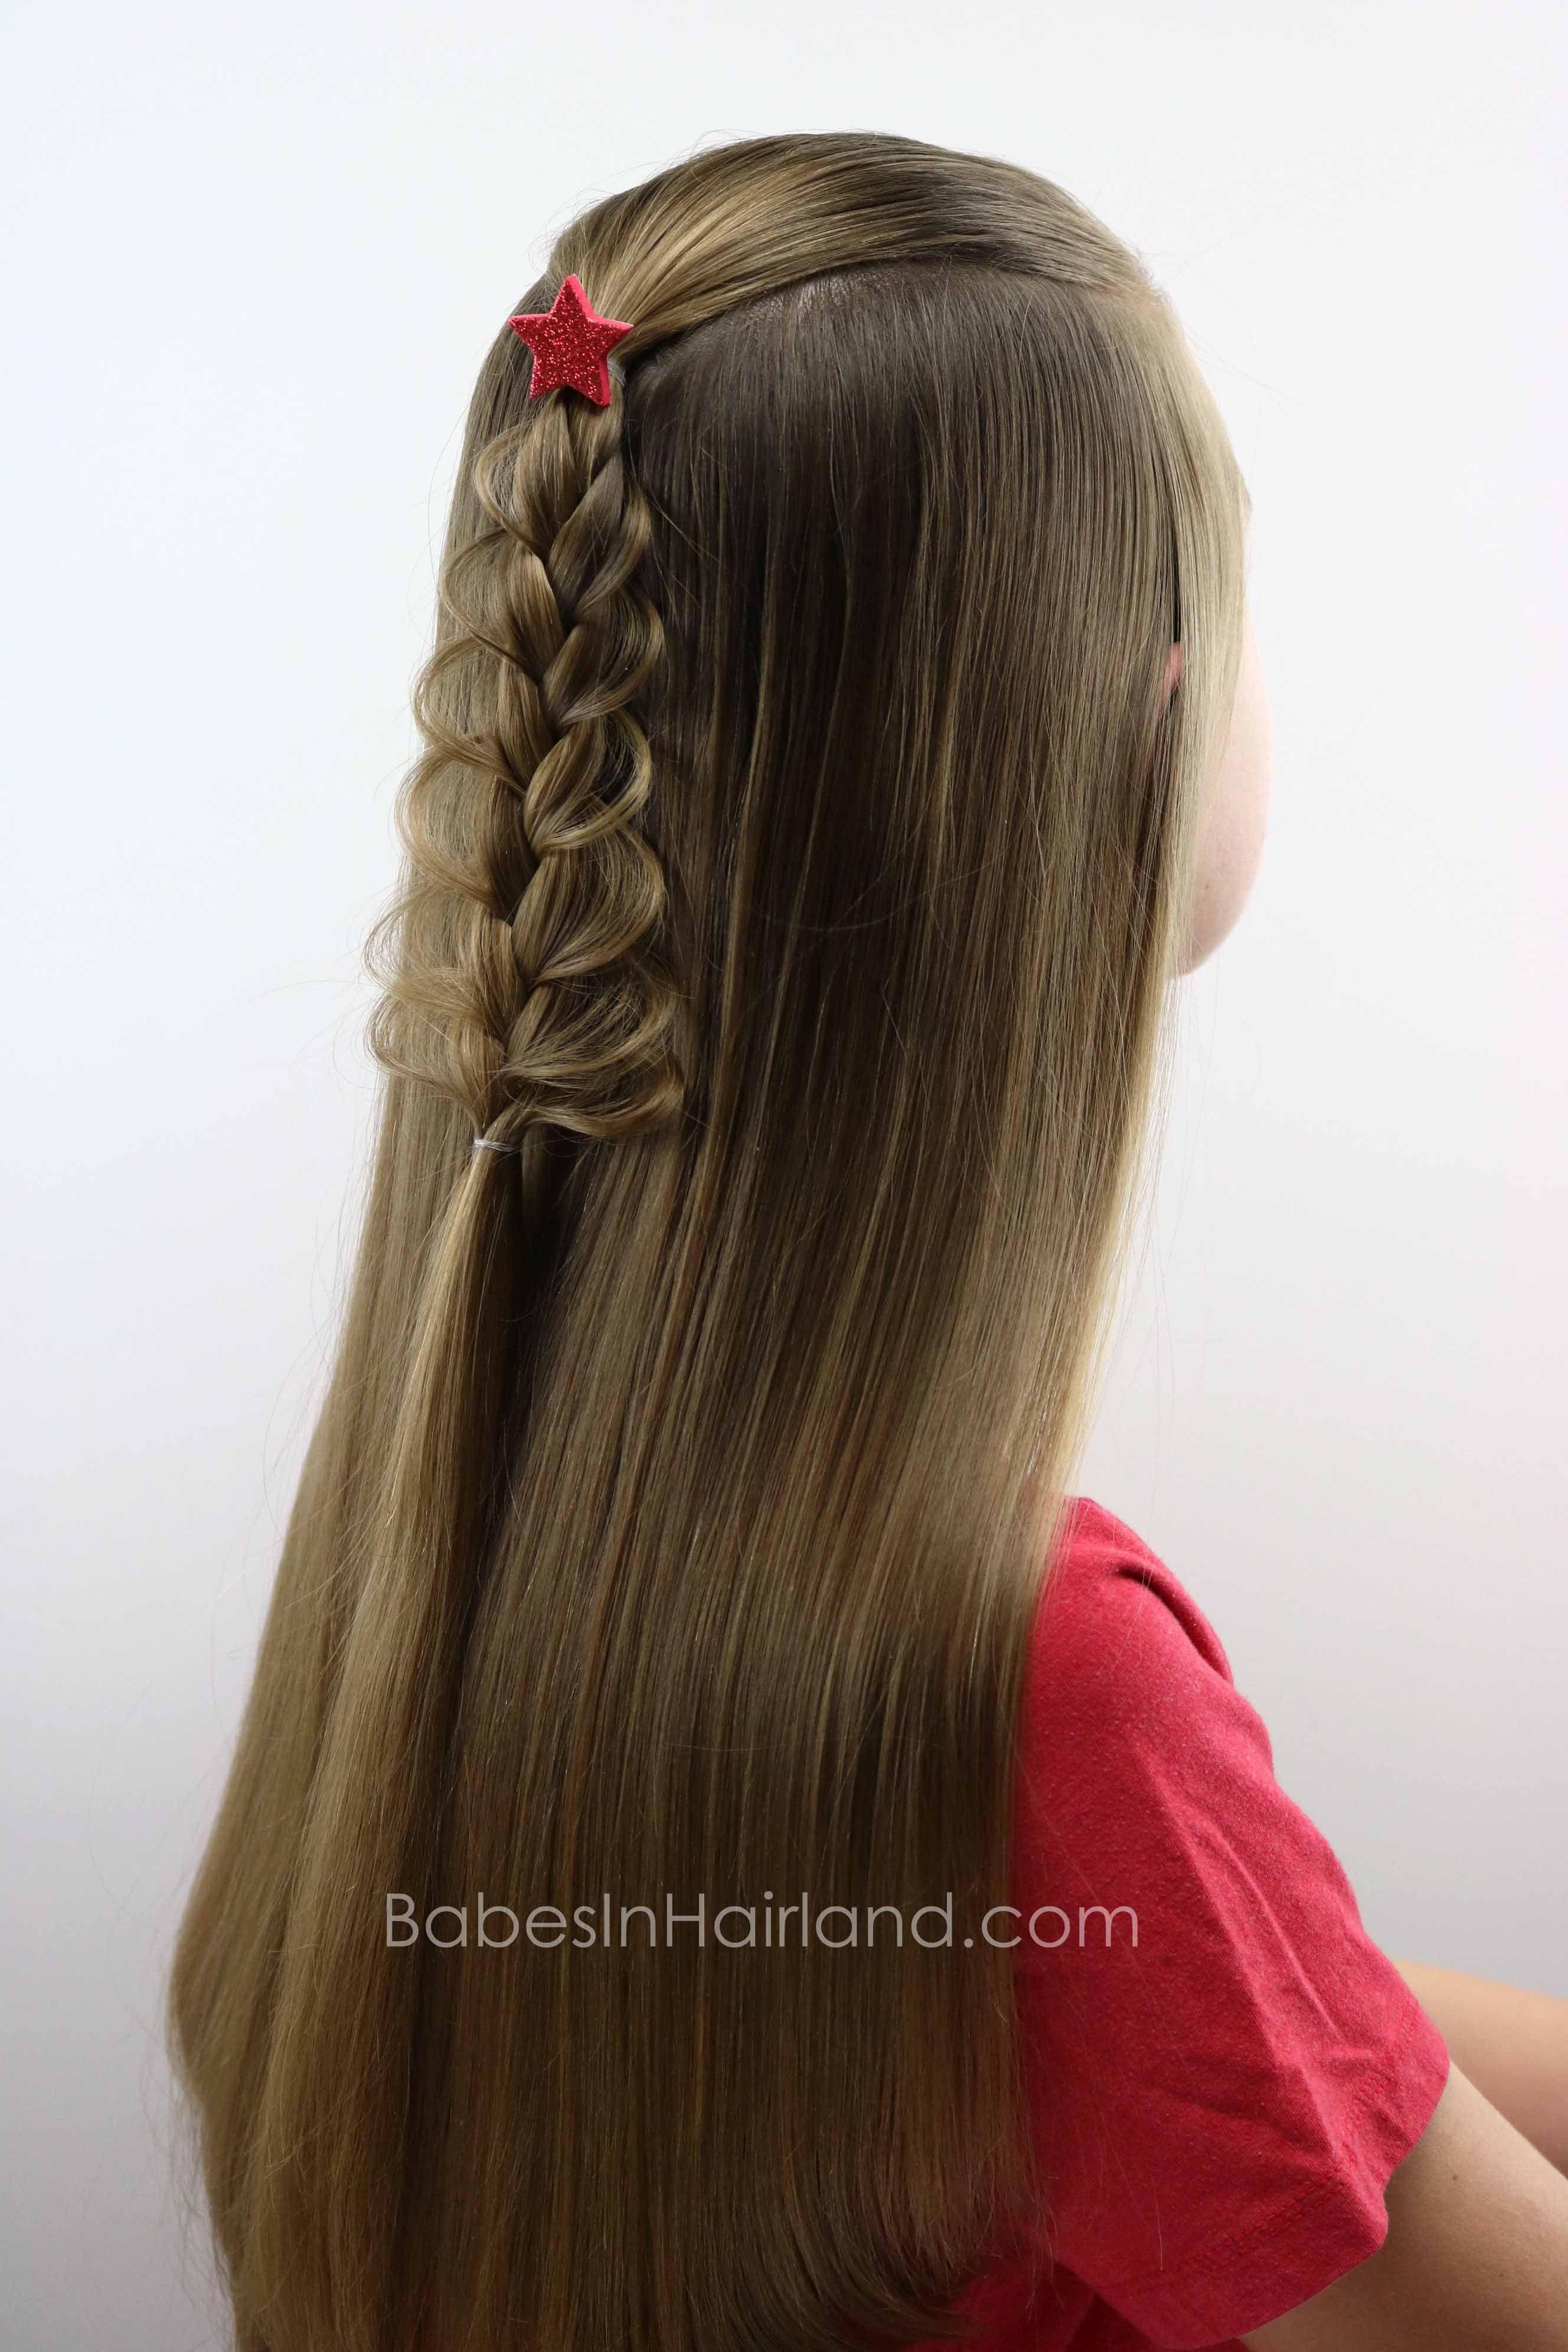 Christmas Tree Loop Braid From Babesinhairland Com Christmas Hair Braid Christmas Tree Braids For Long Hair Braided Hairstyles Face Shape Hairstyles